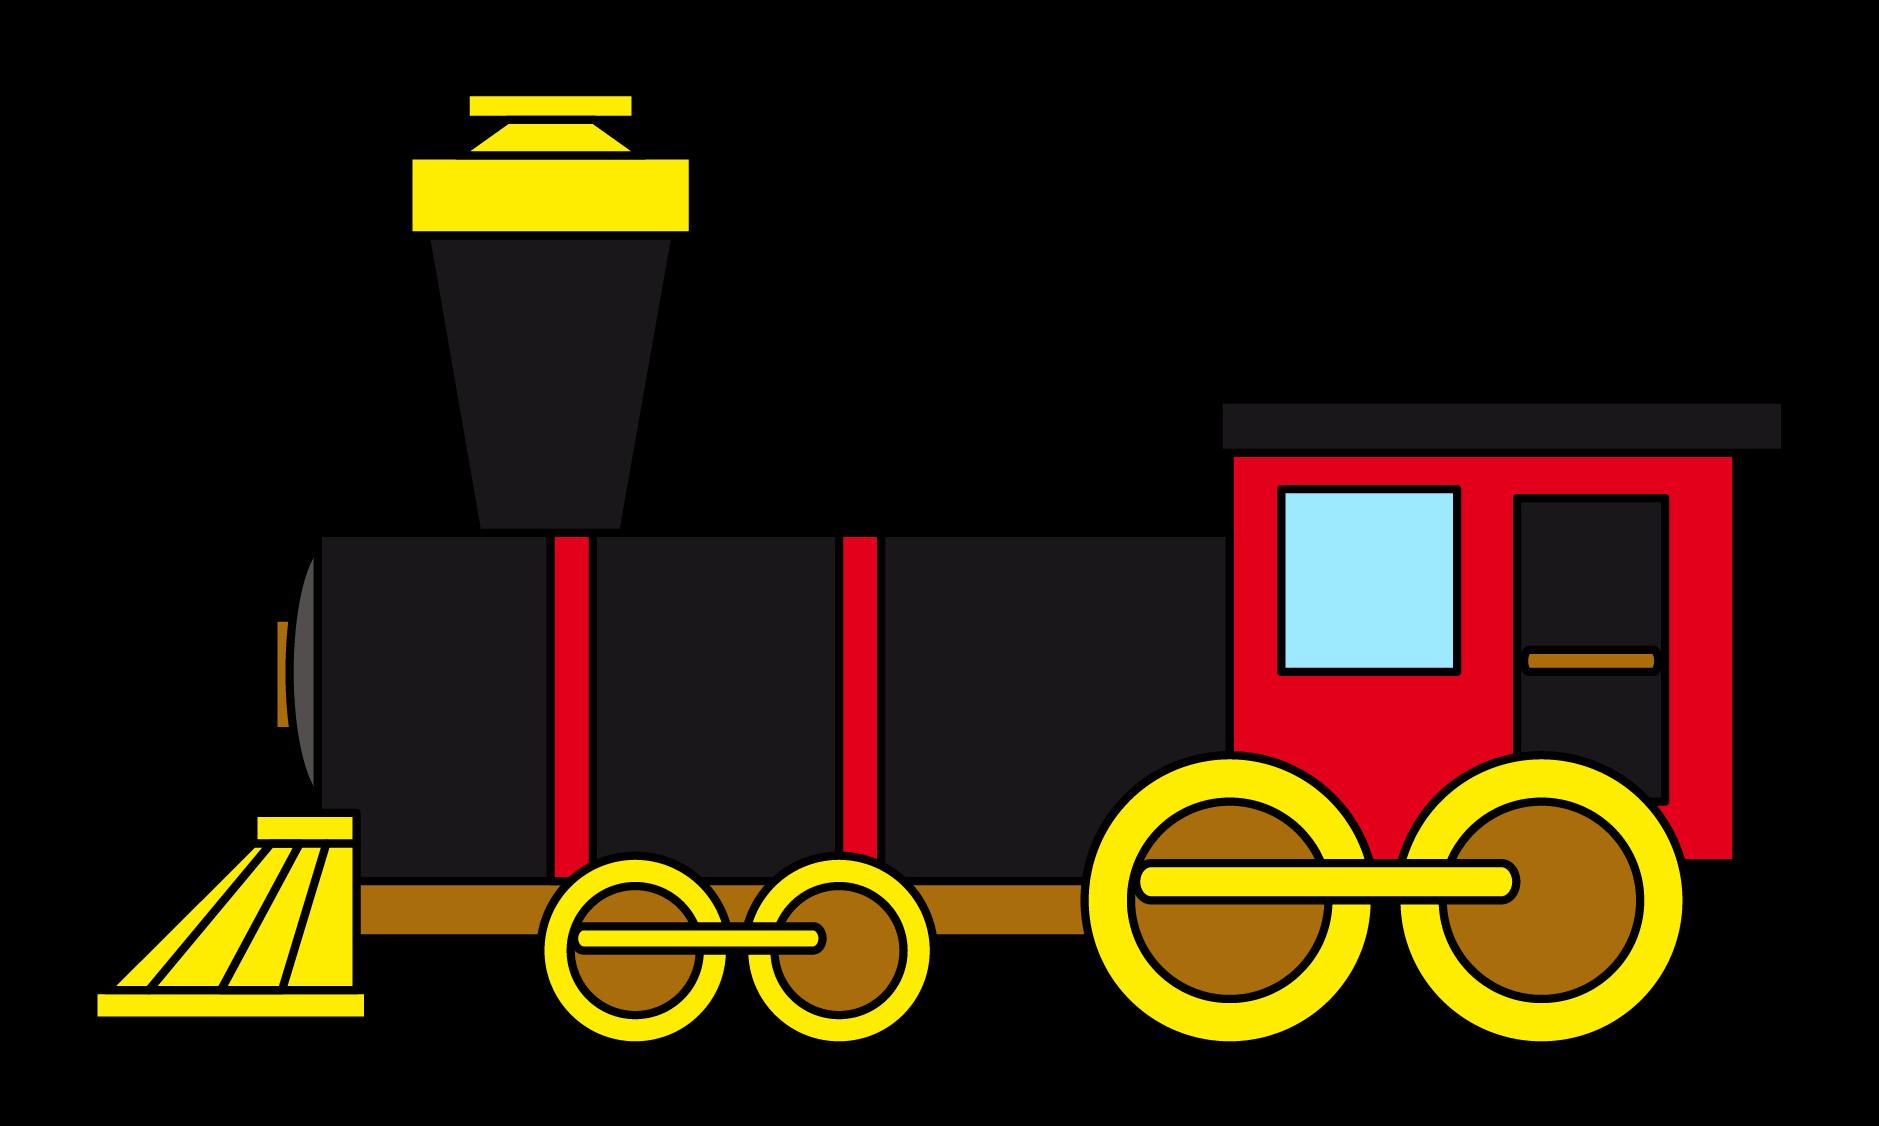 Train Free To Use Clip Art 2-Train free to use clip art 2-17